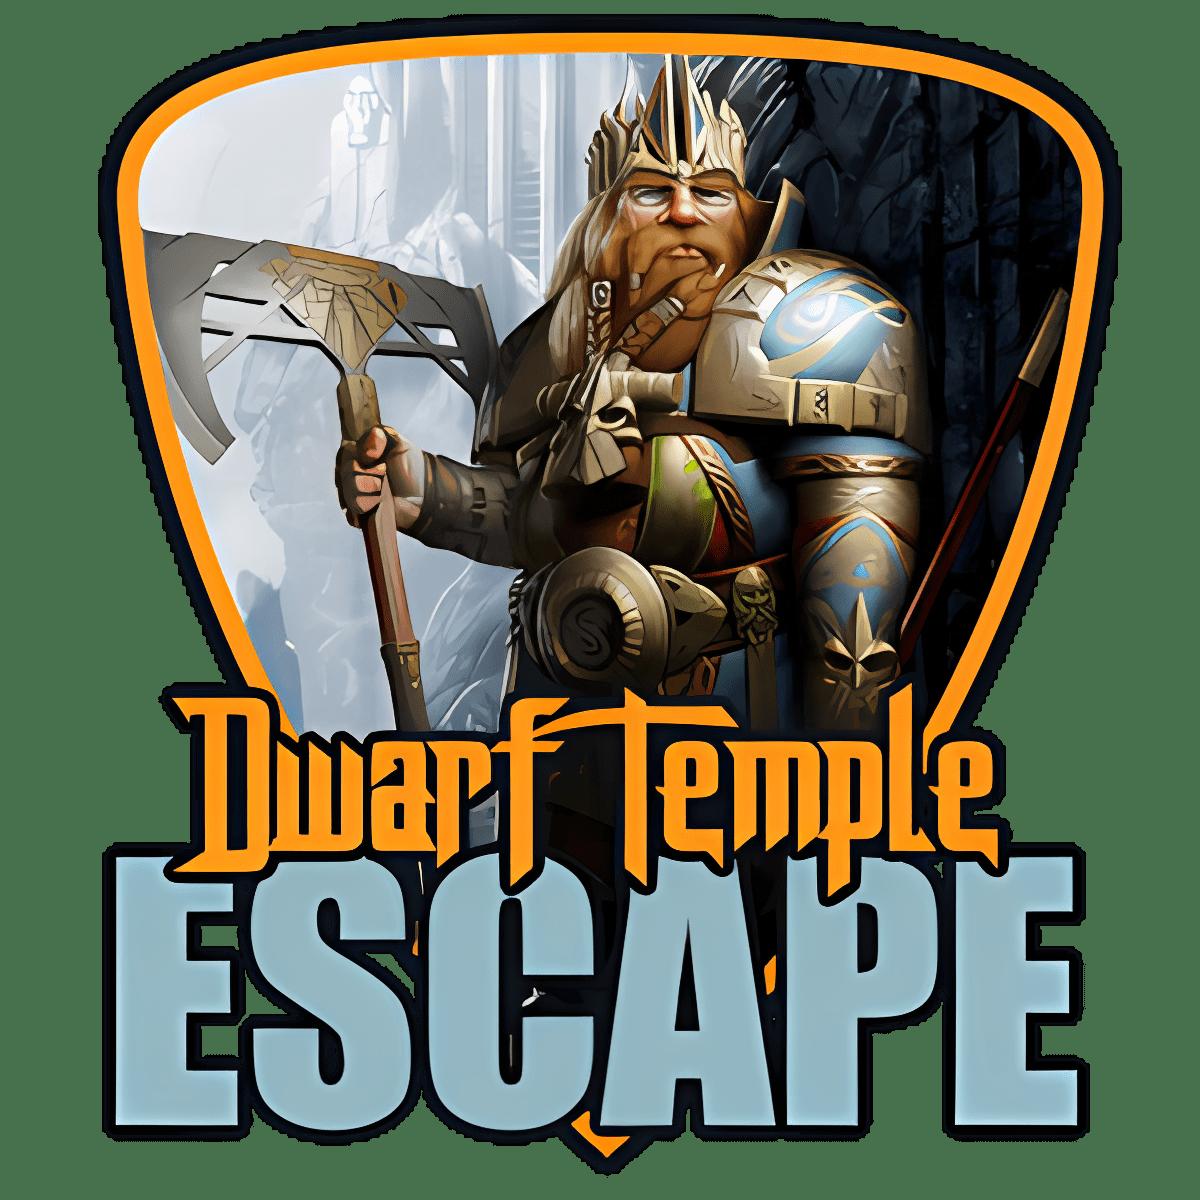 Templo de Escape Enano device-dependant